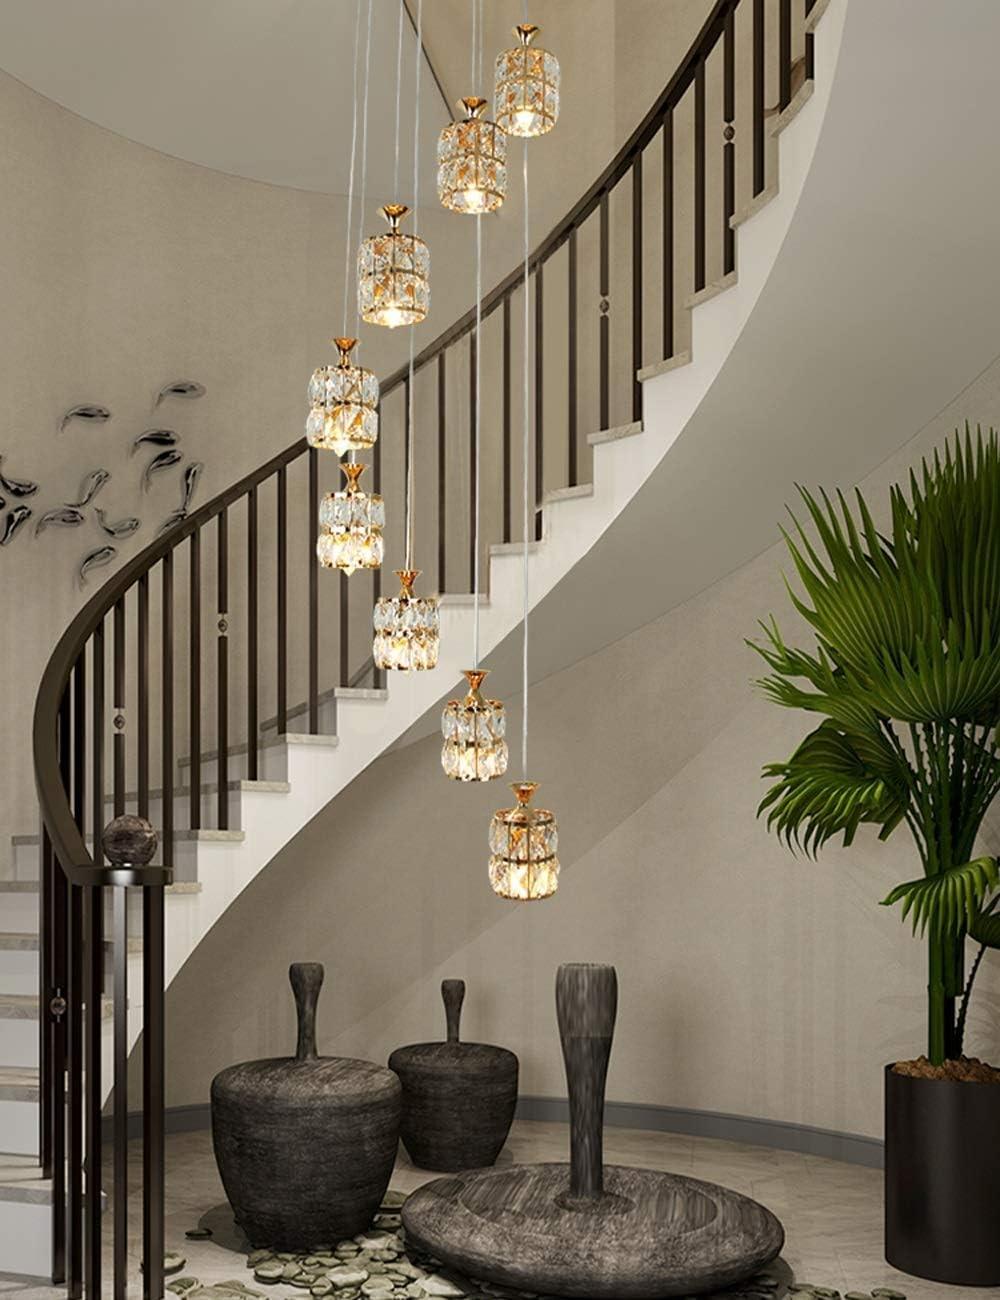 Lámparas de araña Escaleras Escalera de caracol Lámpara de araña Lámpara colgante larga Moderna Minimalista Duplex Villa Casa Piso Gran sala de estar Luz de techo de cristal A+: Amazon.es: Hogar